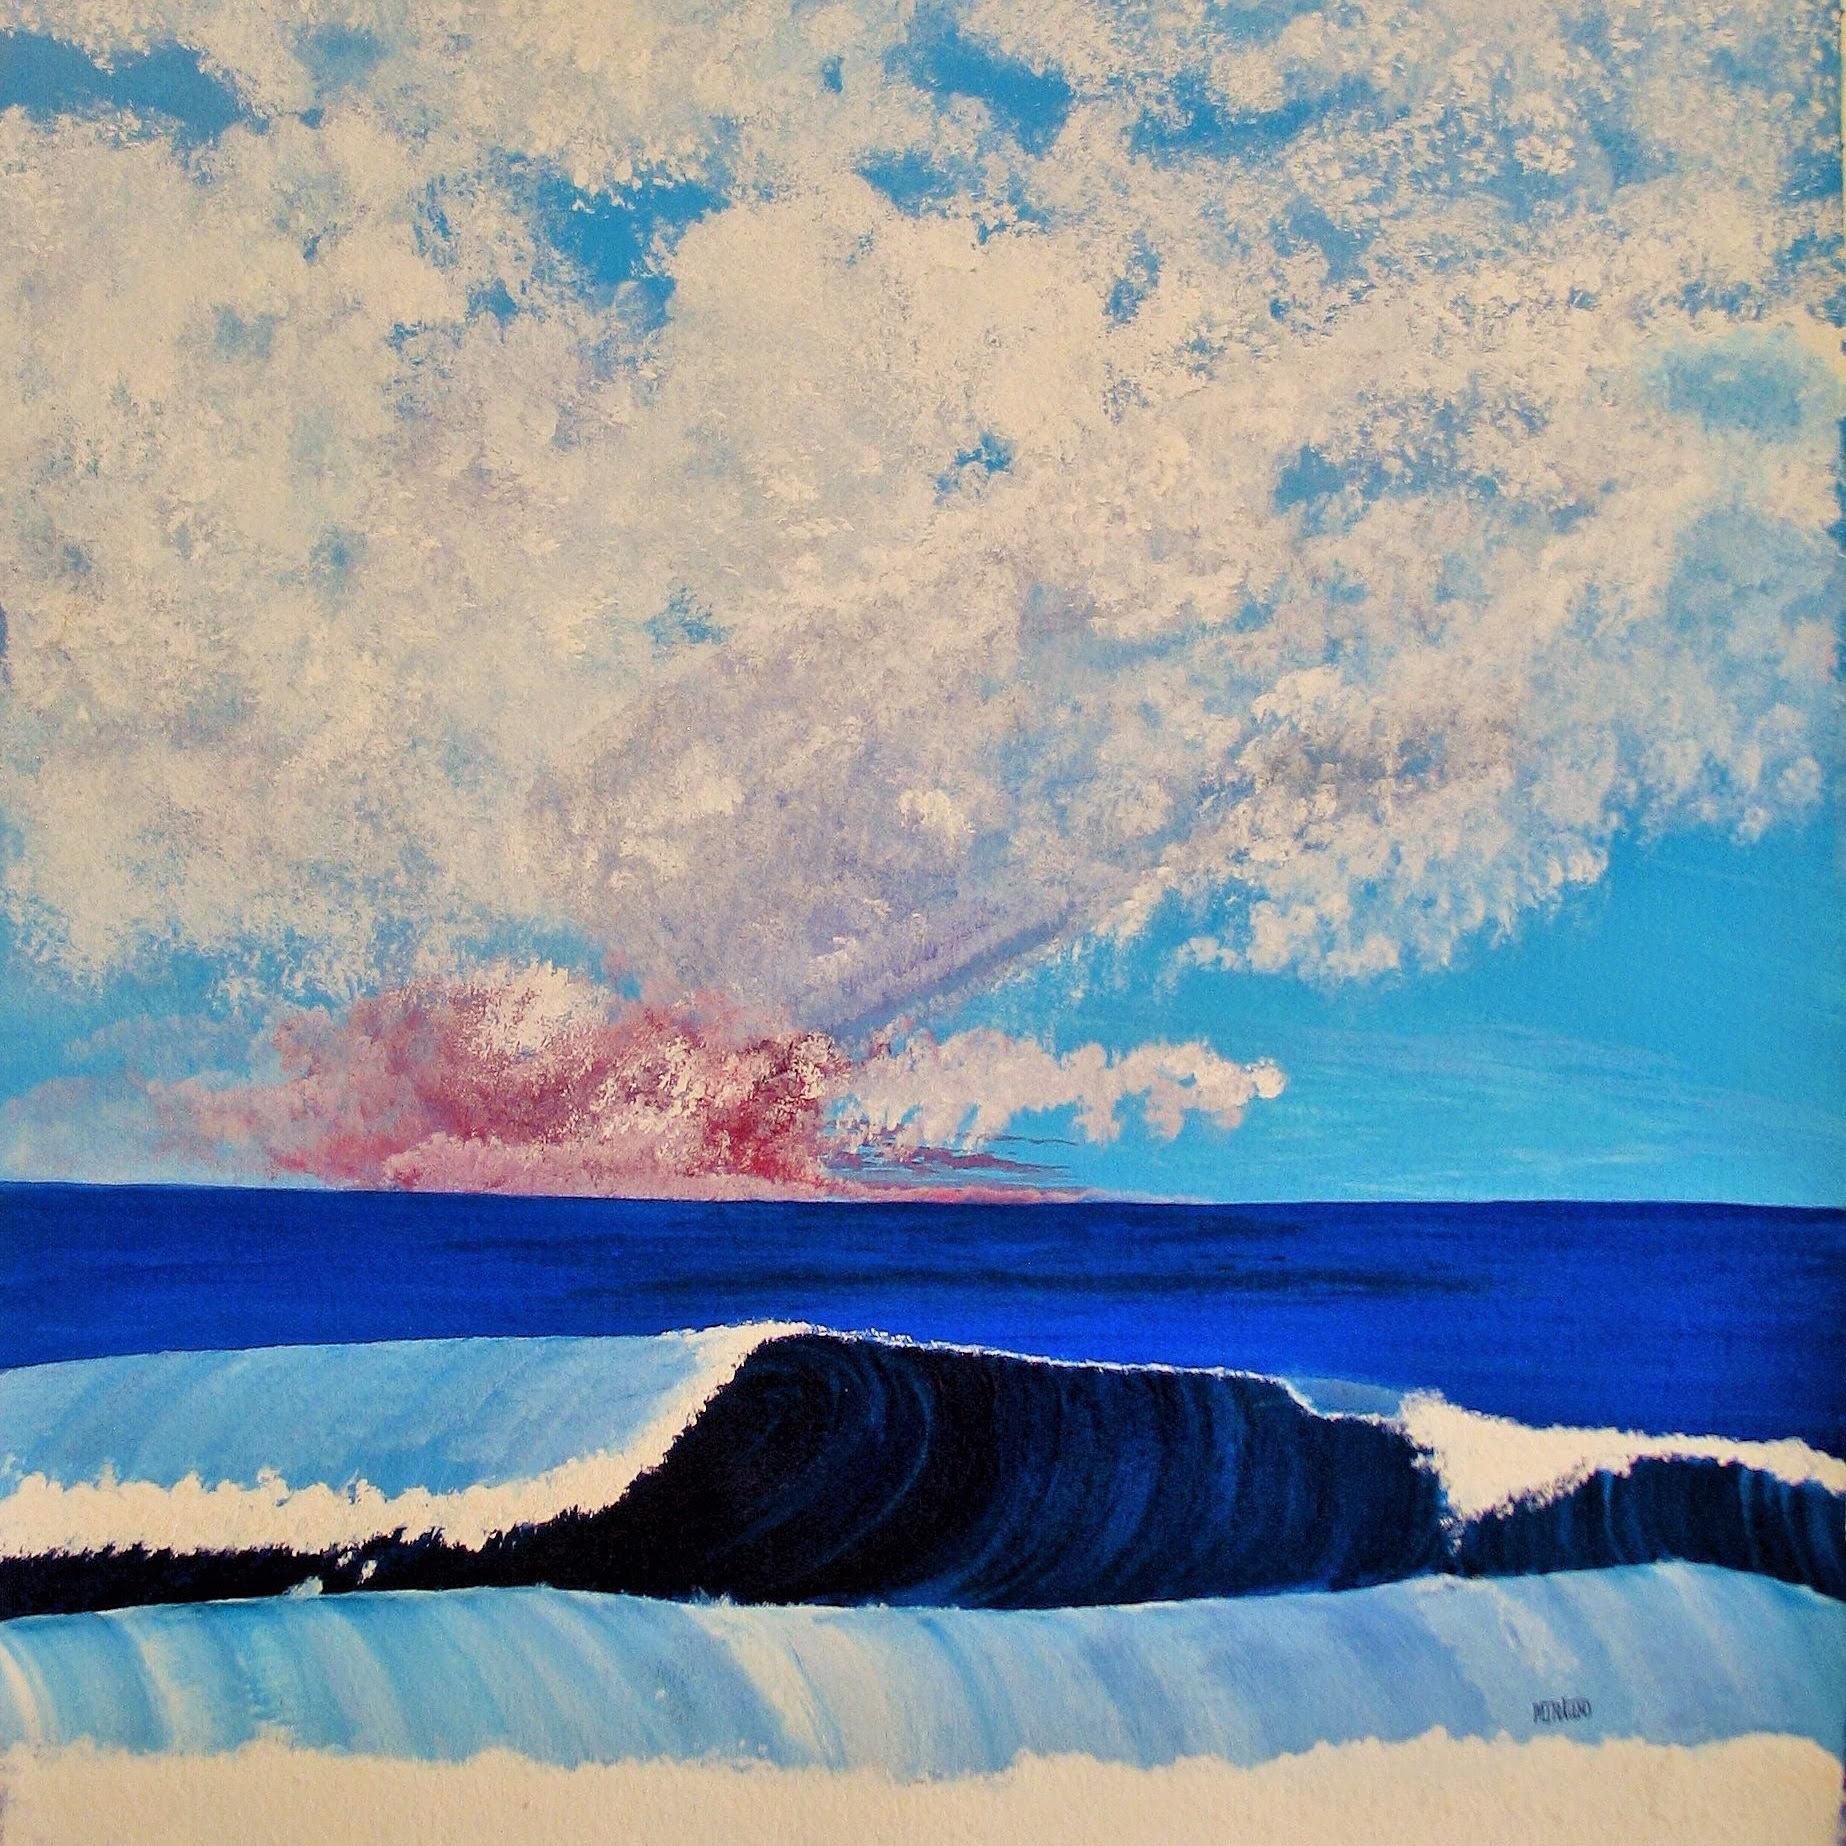 SAILOR JUICE artwork by John Geiser - art listed for sale on Artplode